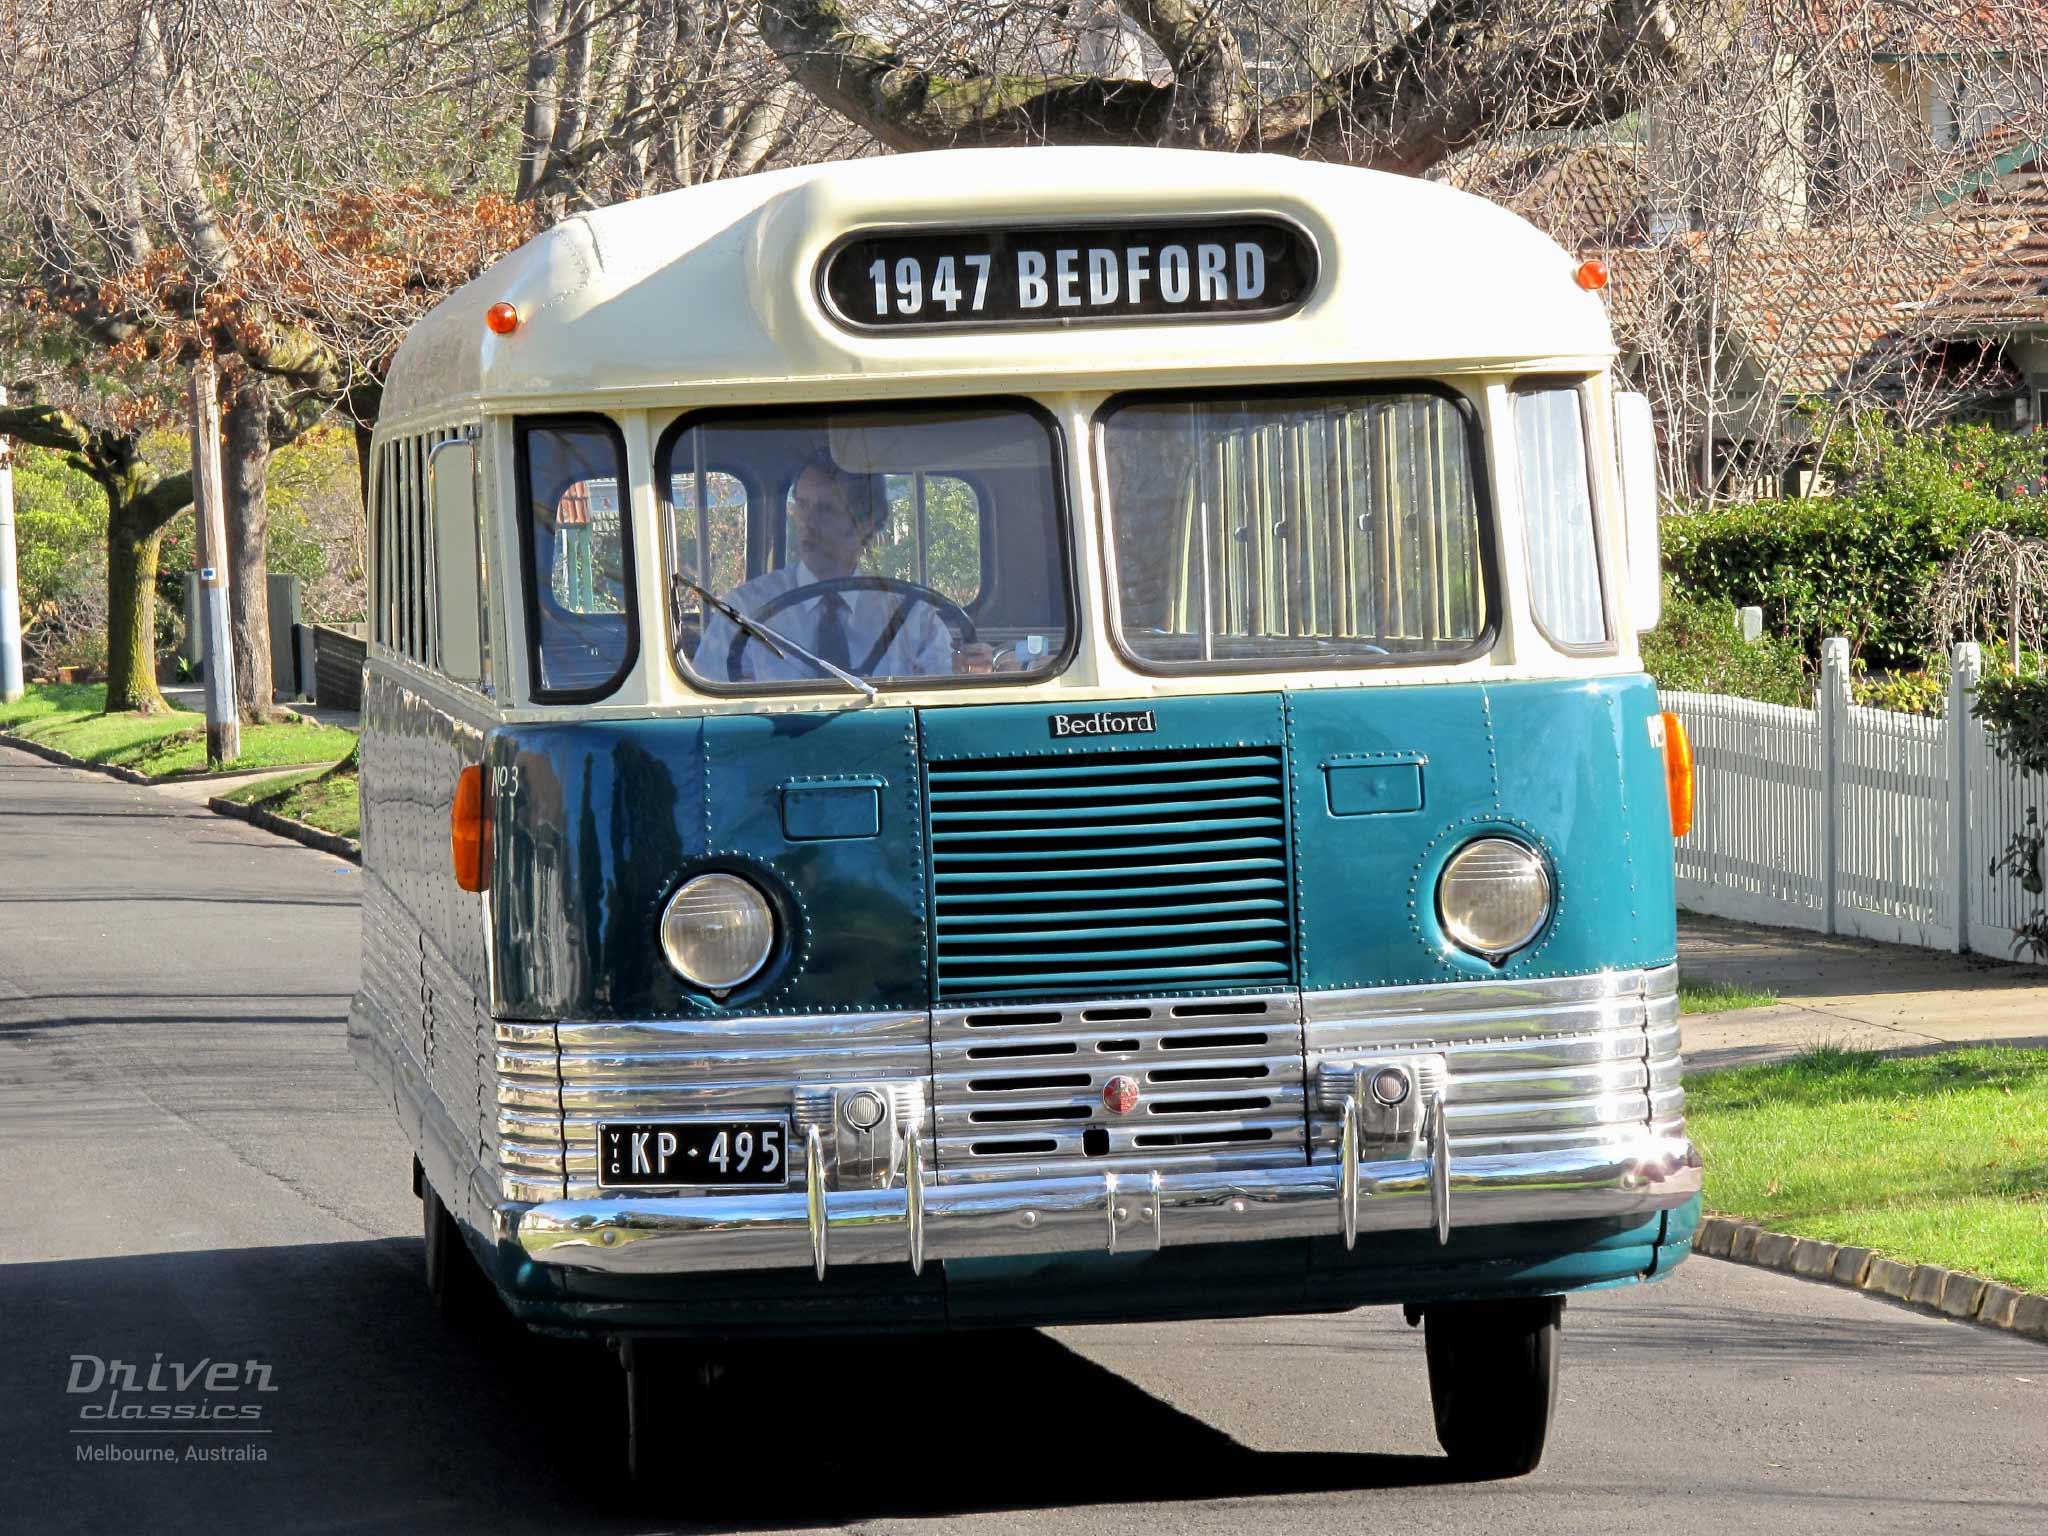 Bedford OB bus 1947 model